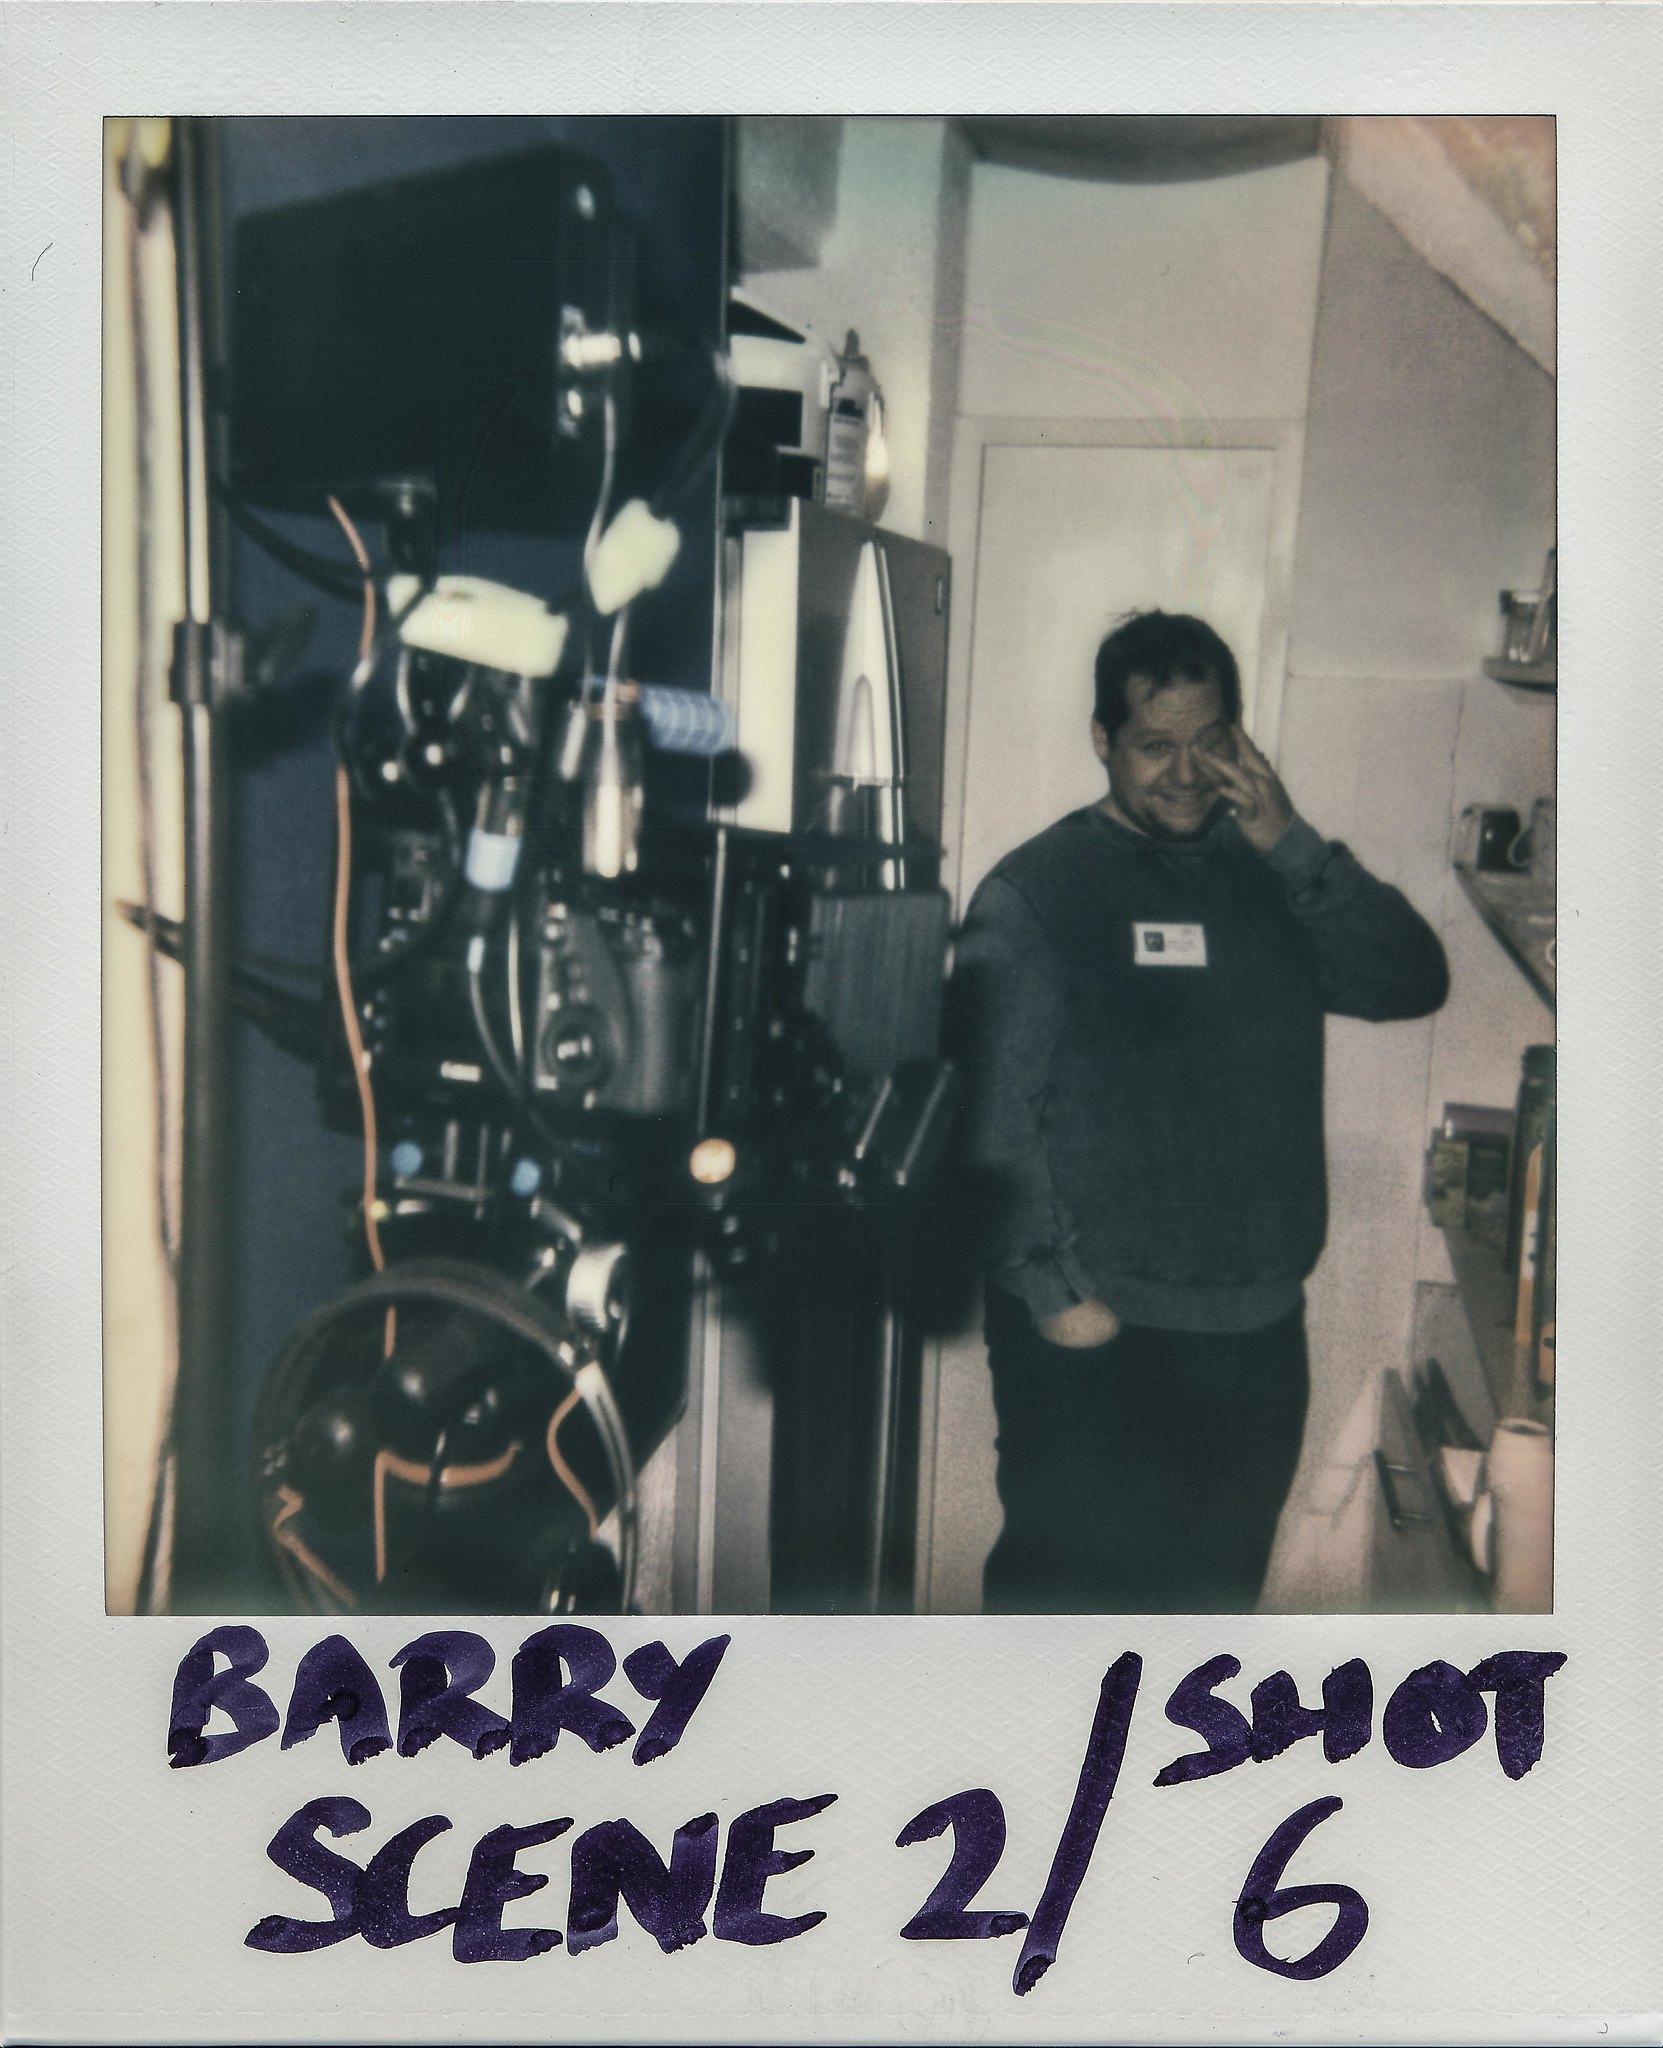 Barry Scene 2 Shot 6